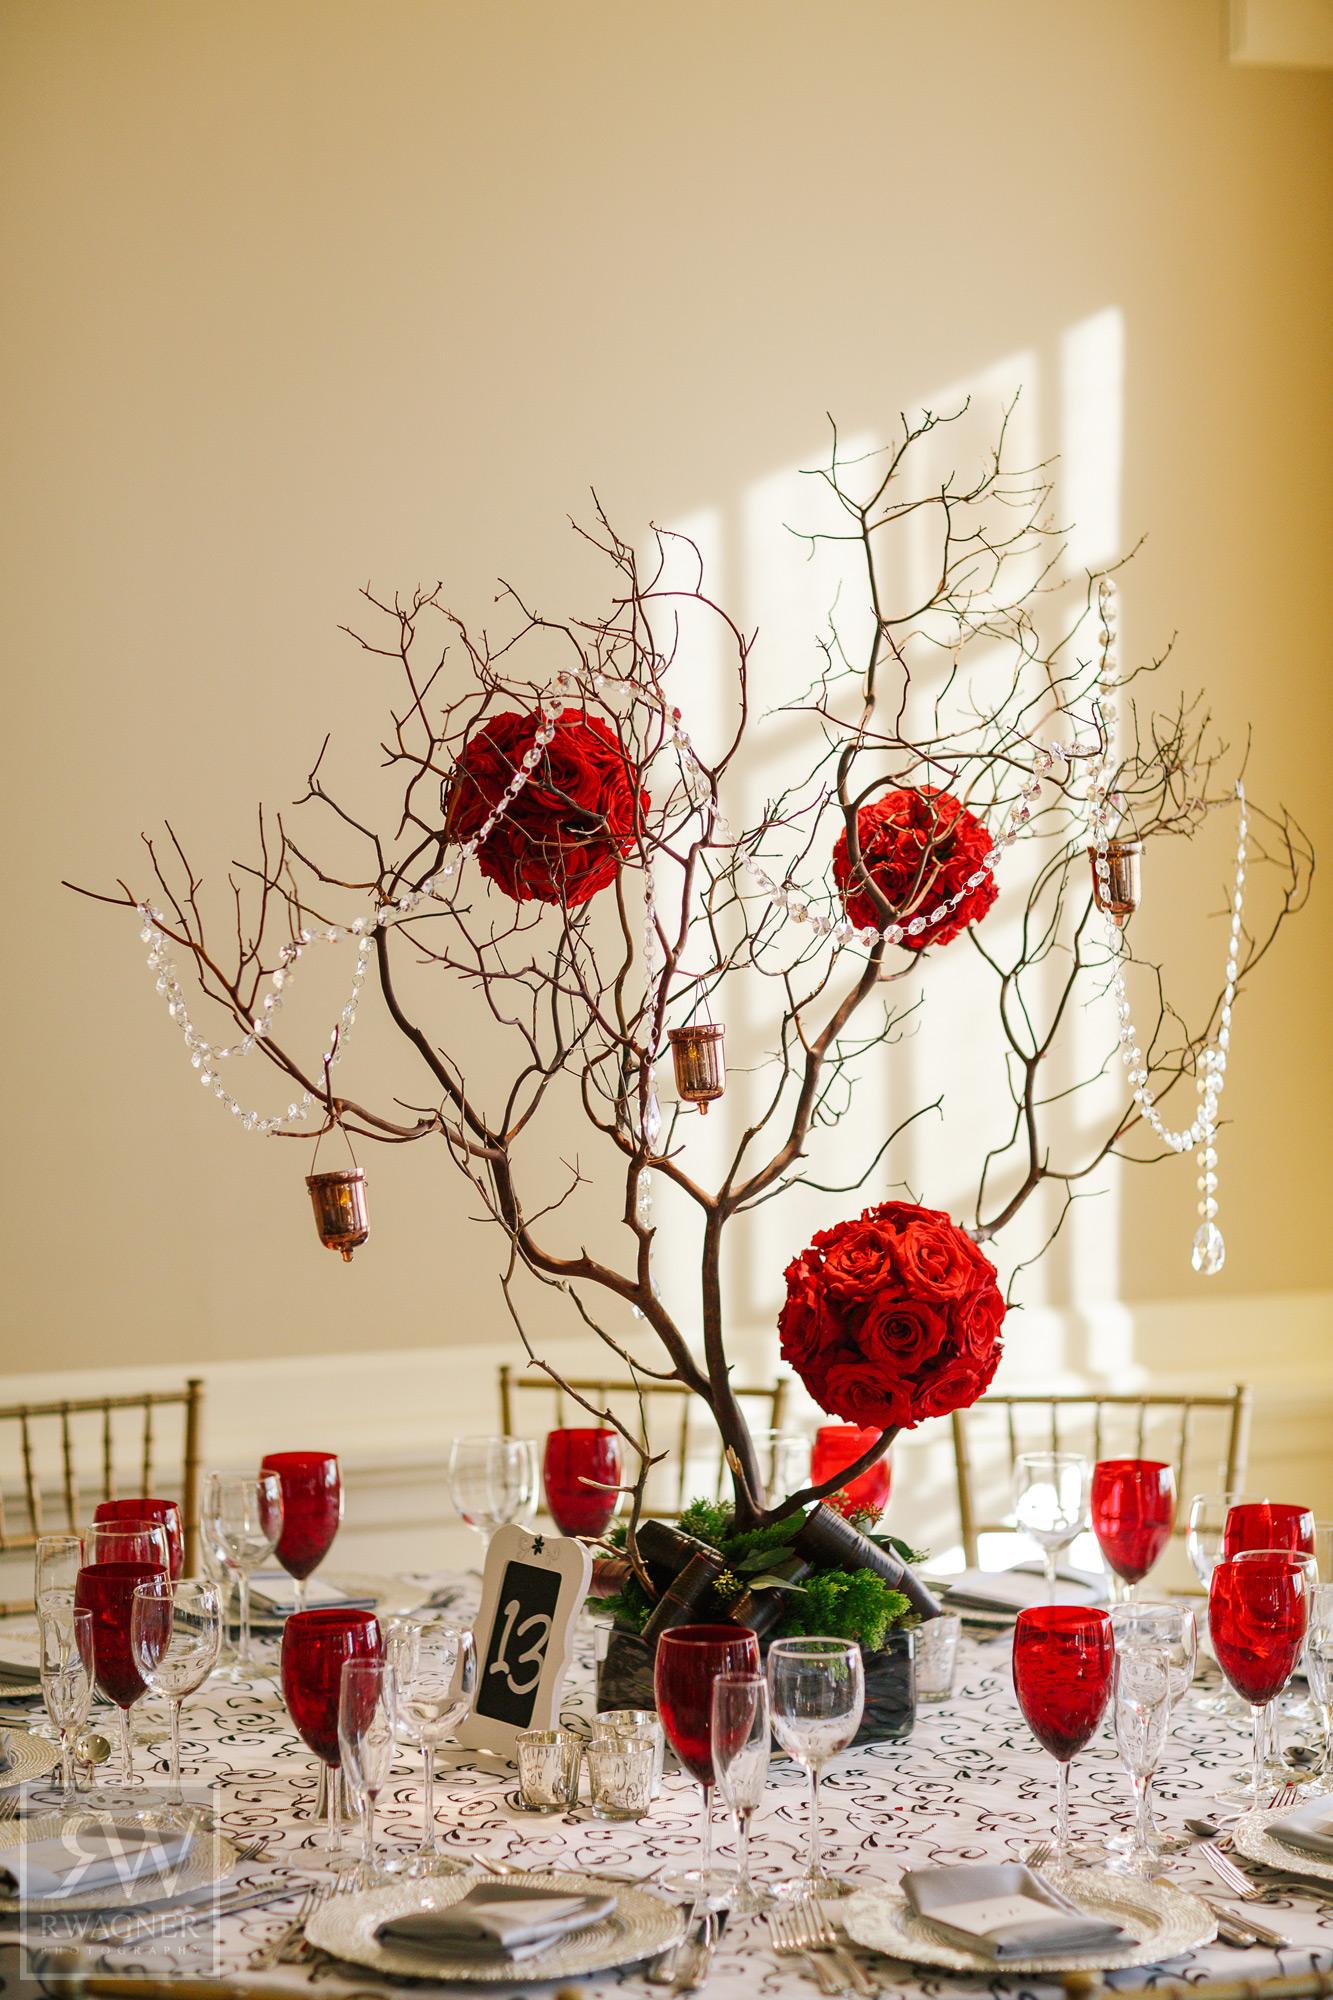 ceci_new_york_luxury_wedding_invitations_couture_red_black_white_real_wedding_dramatic_inn_at_longshore_v286_18.jpg